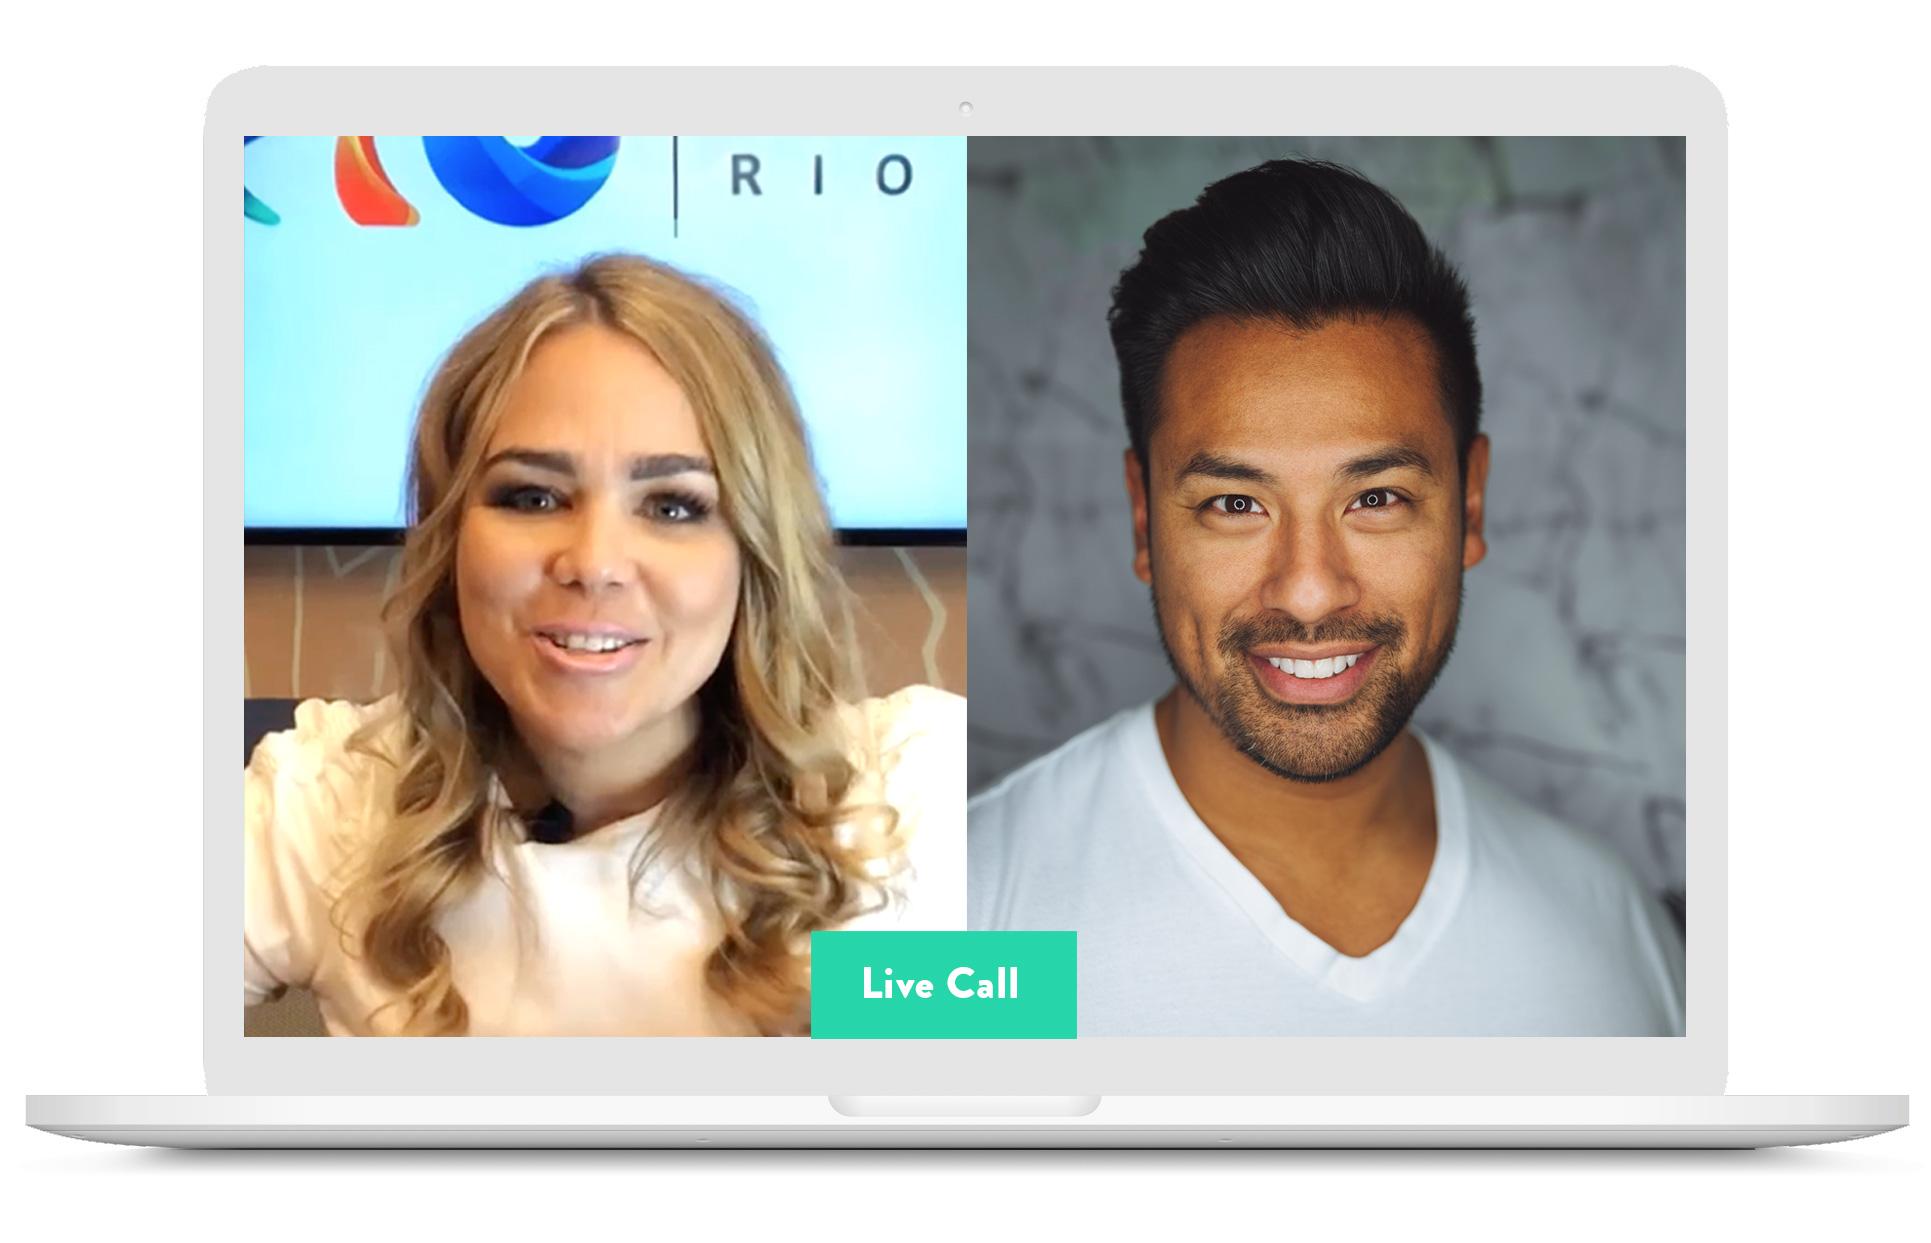 Live_Call_06_Group_Rio_Media.jpg